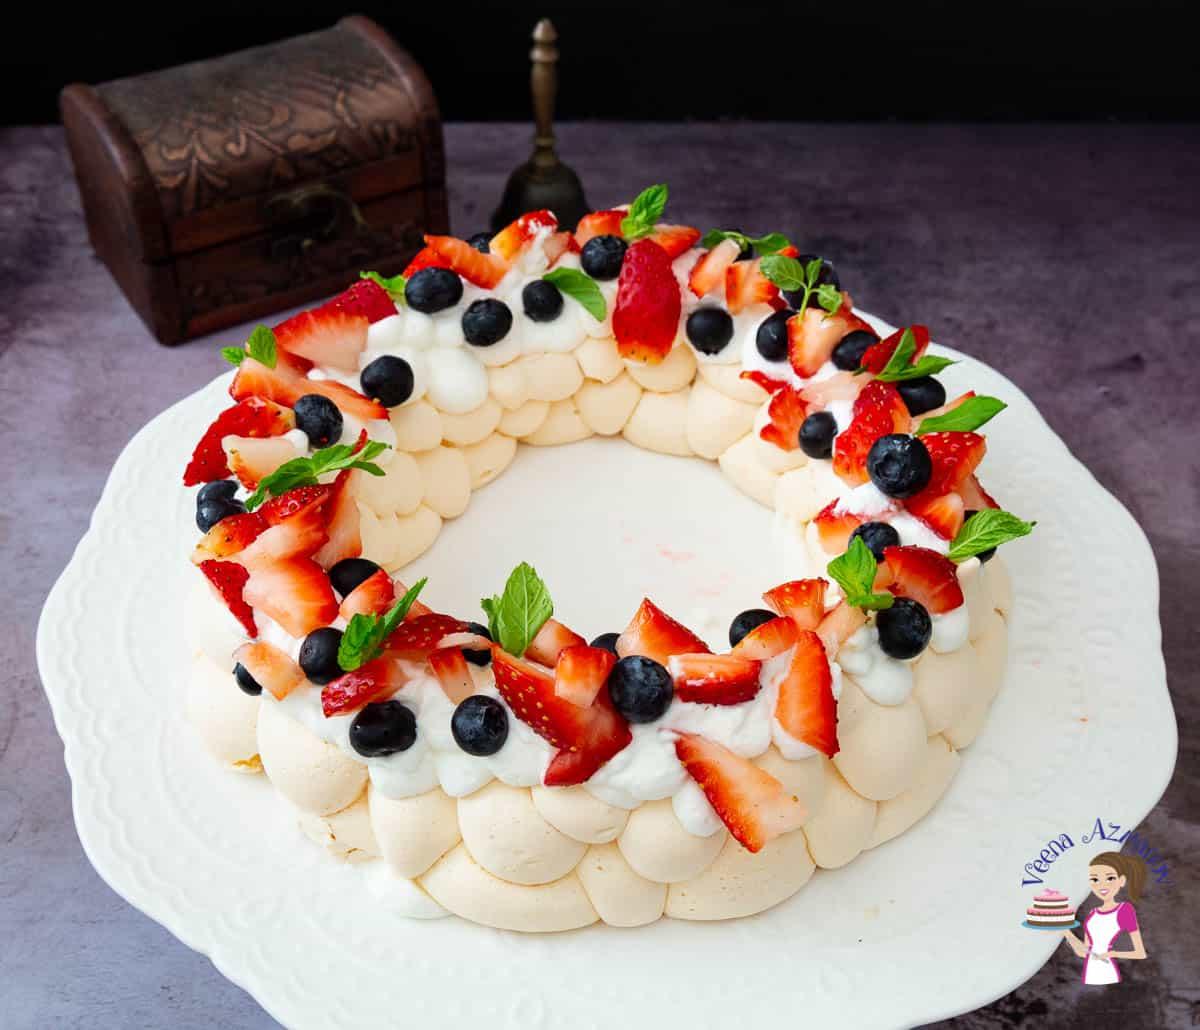 A meringue pavlova on a cake stand